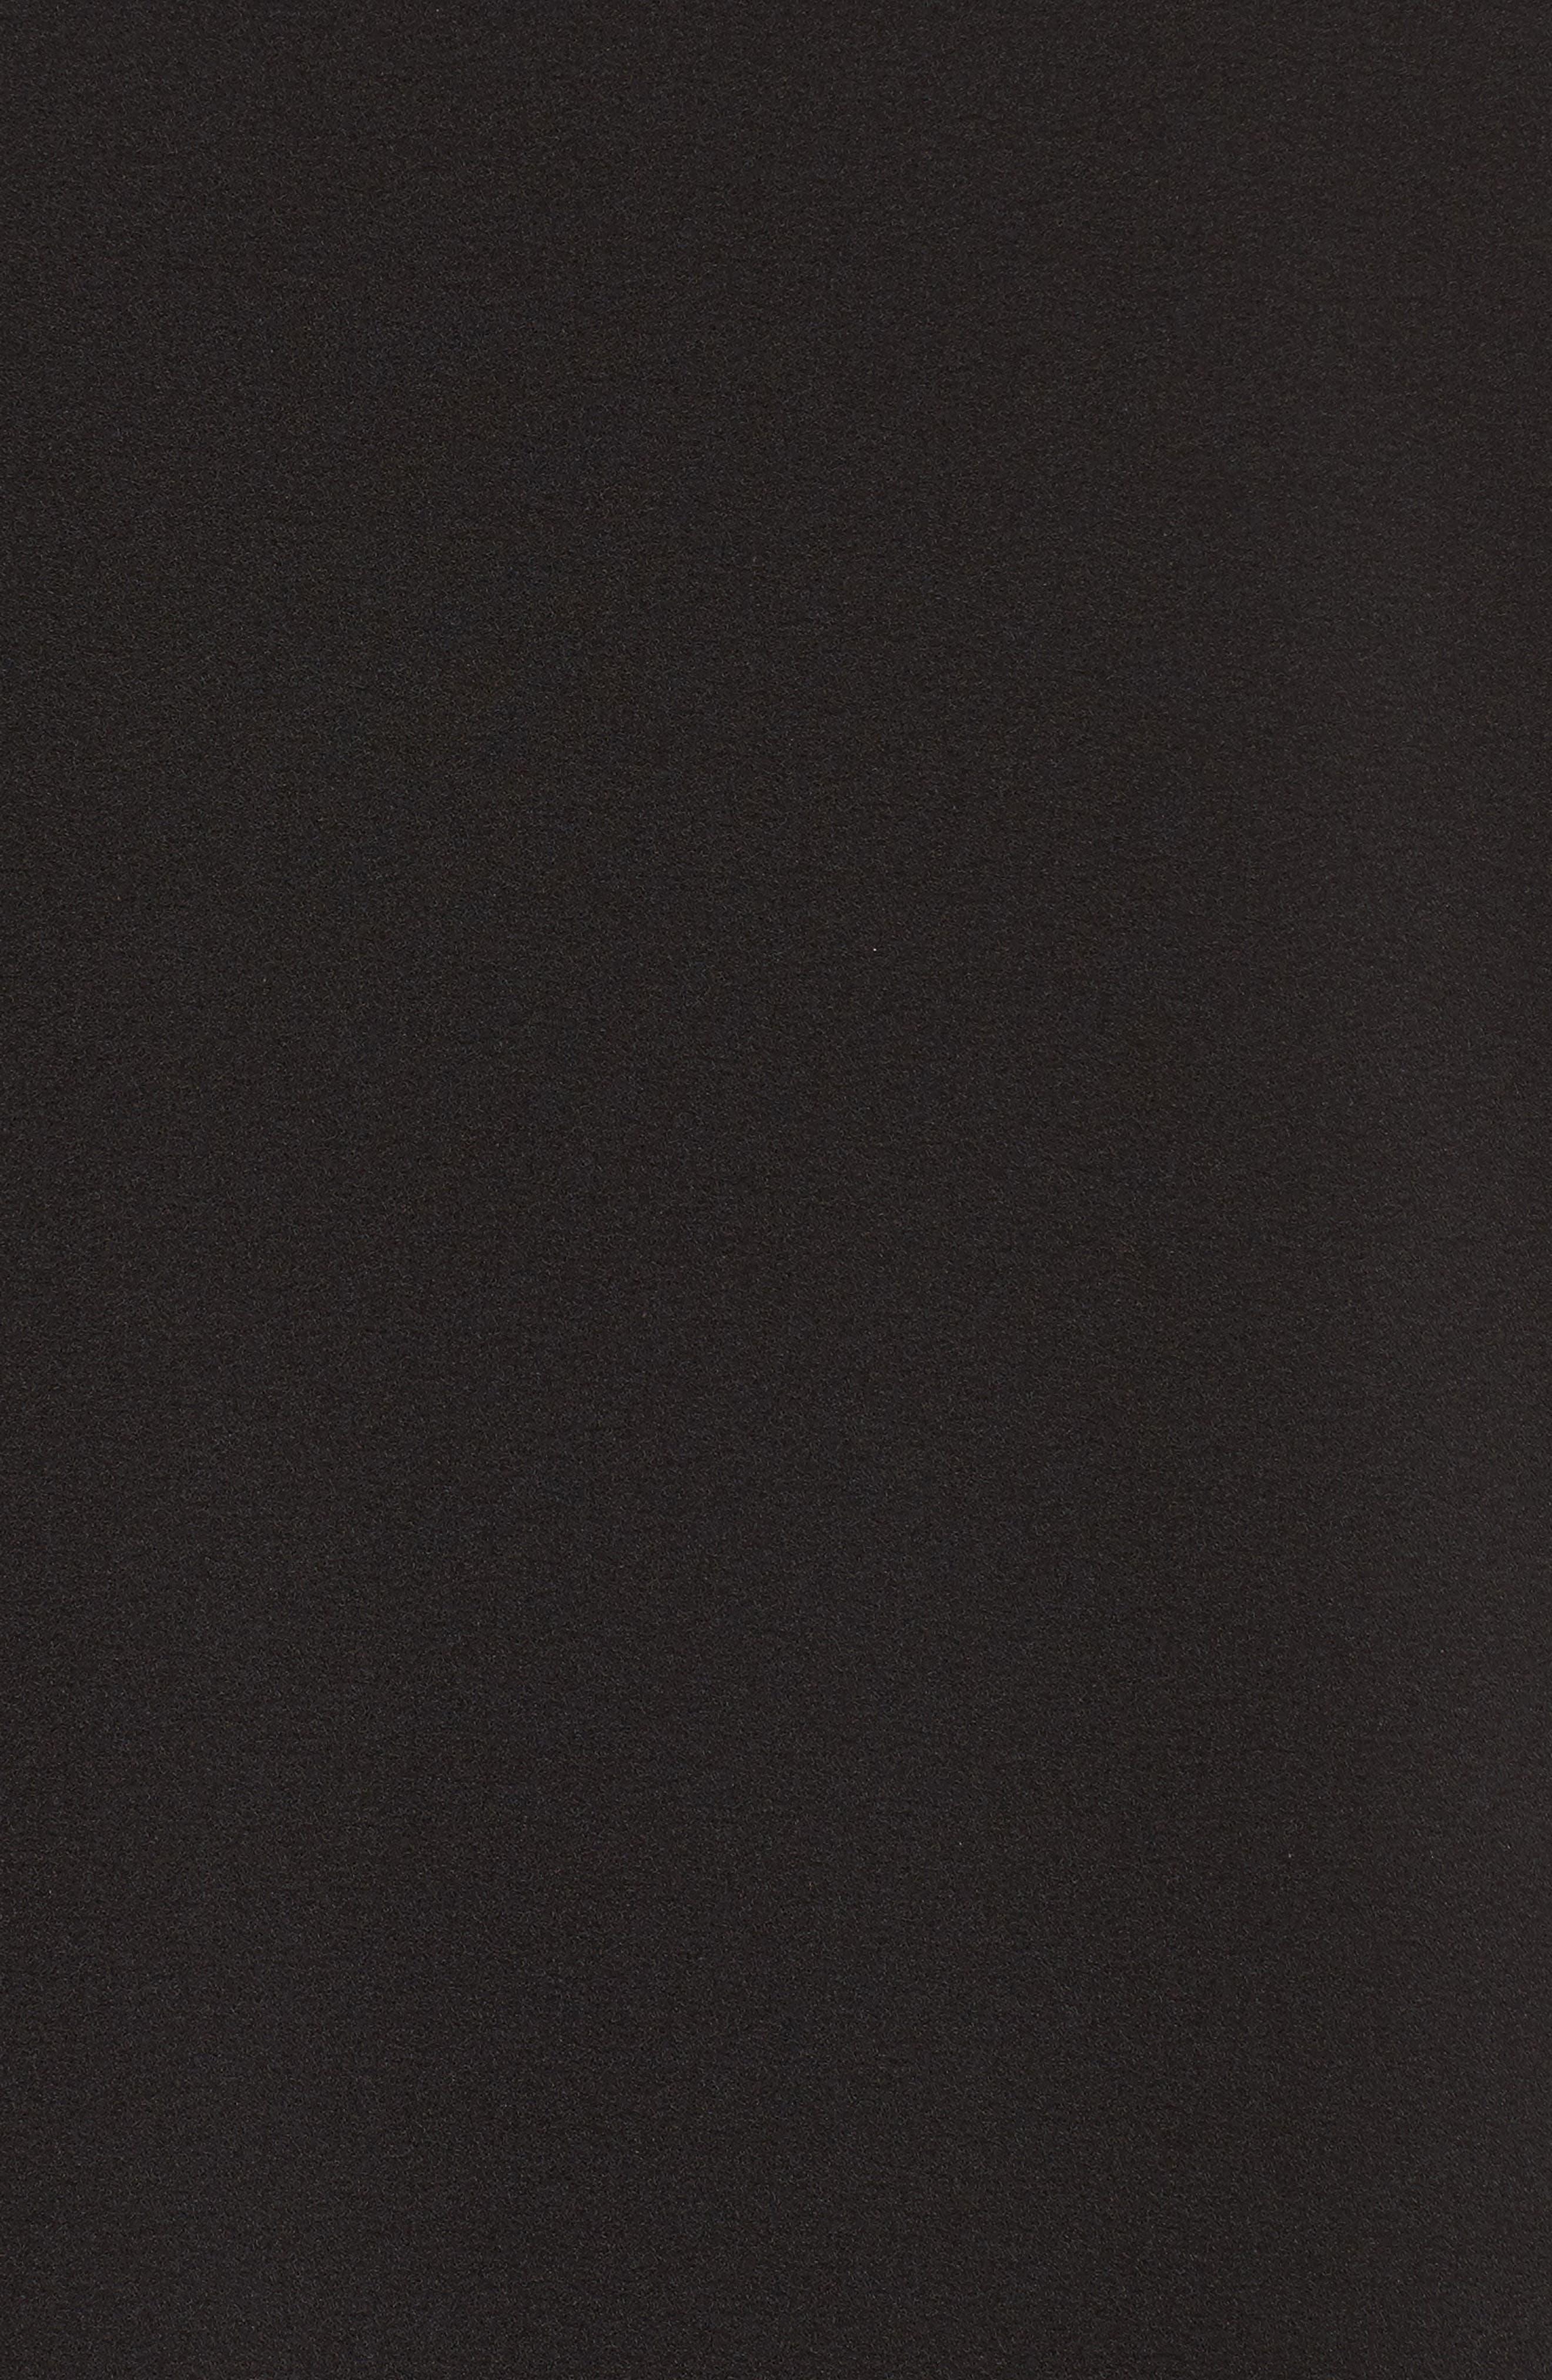 Emerson Shift Dress,                             Alternate thumbnail 5, color,                             001